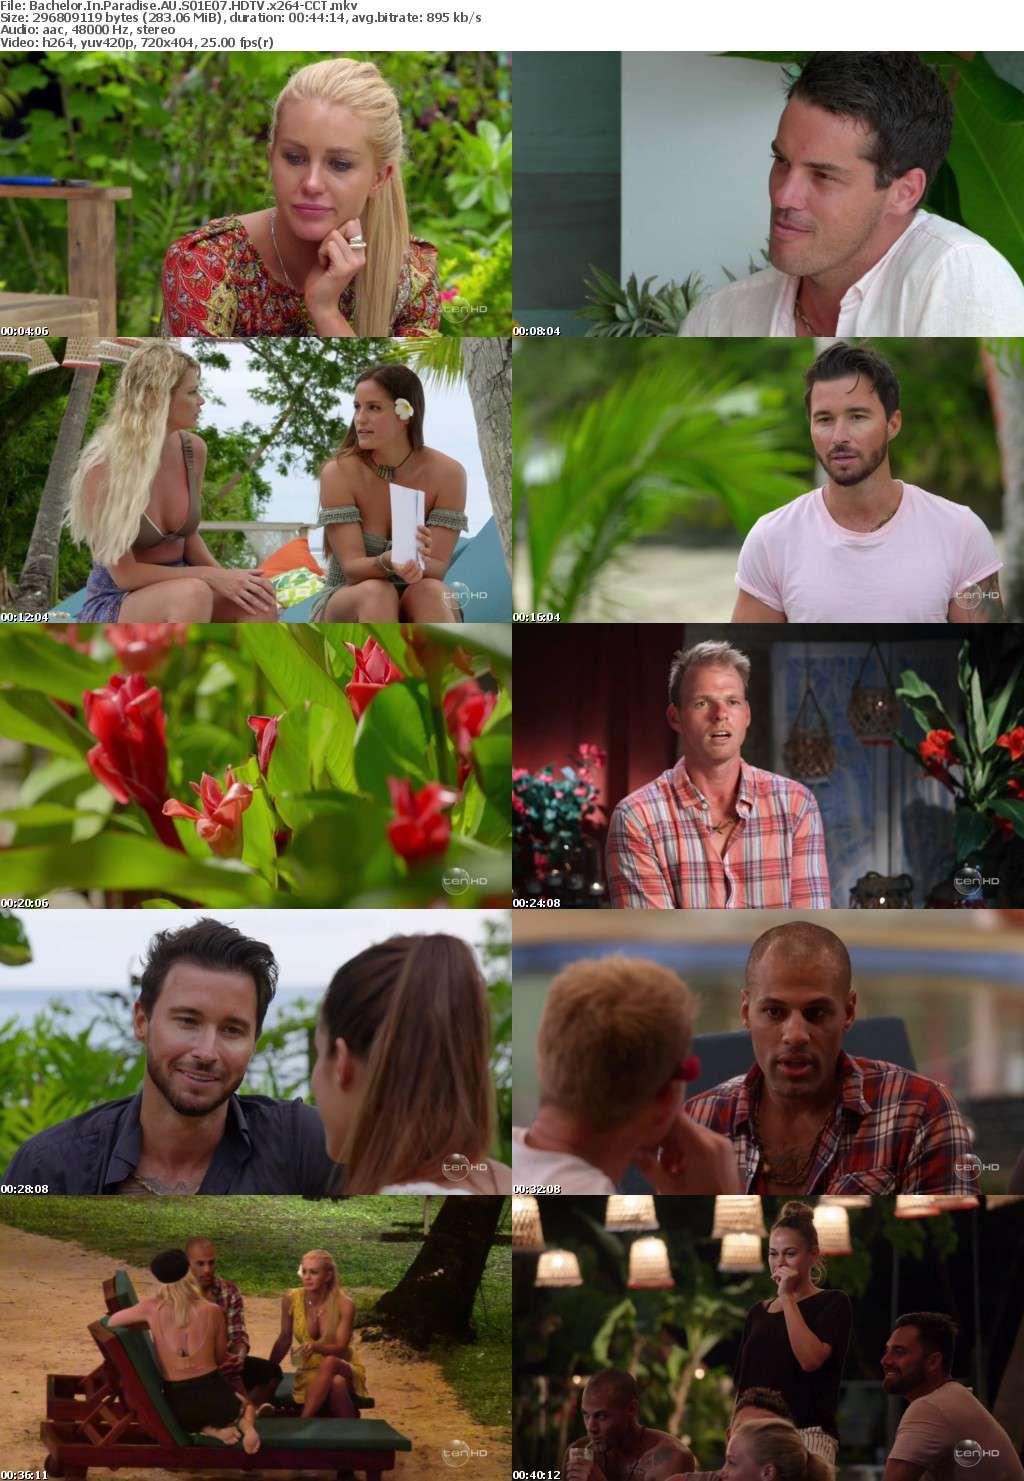 Bachelor In Paradise AU S01E07 HDTV x264-CCT